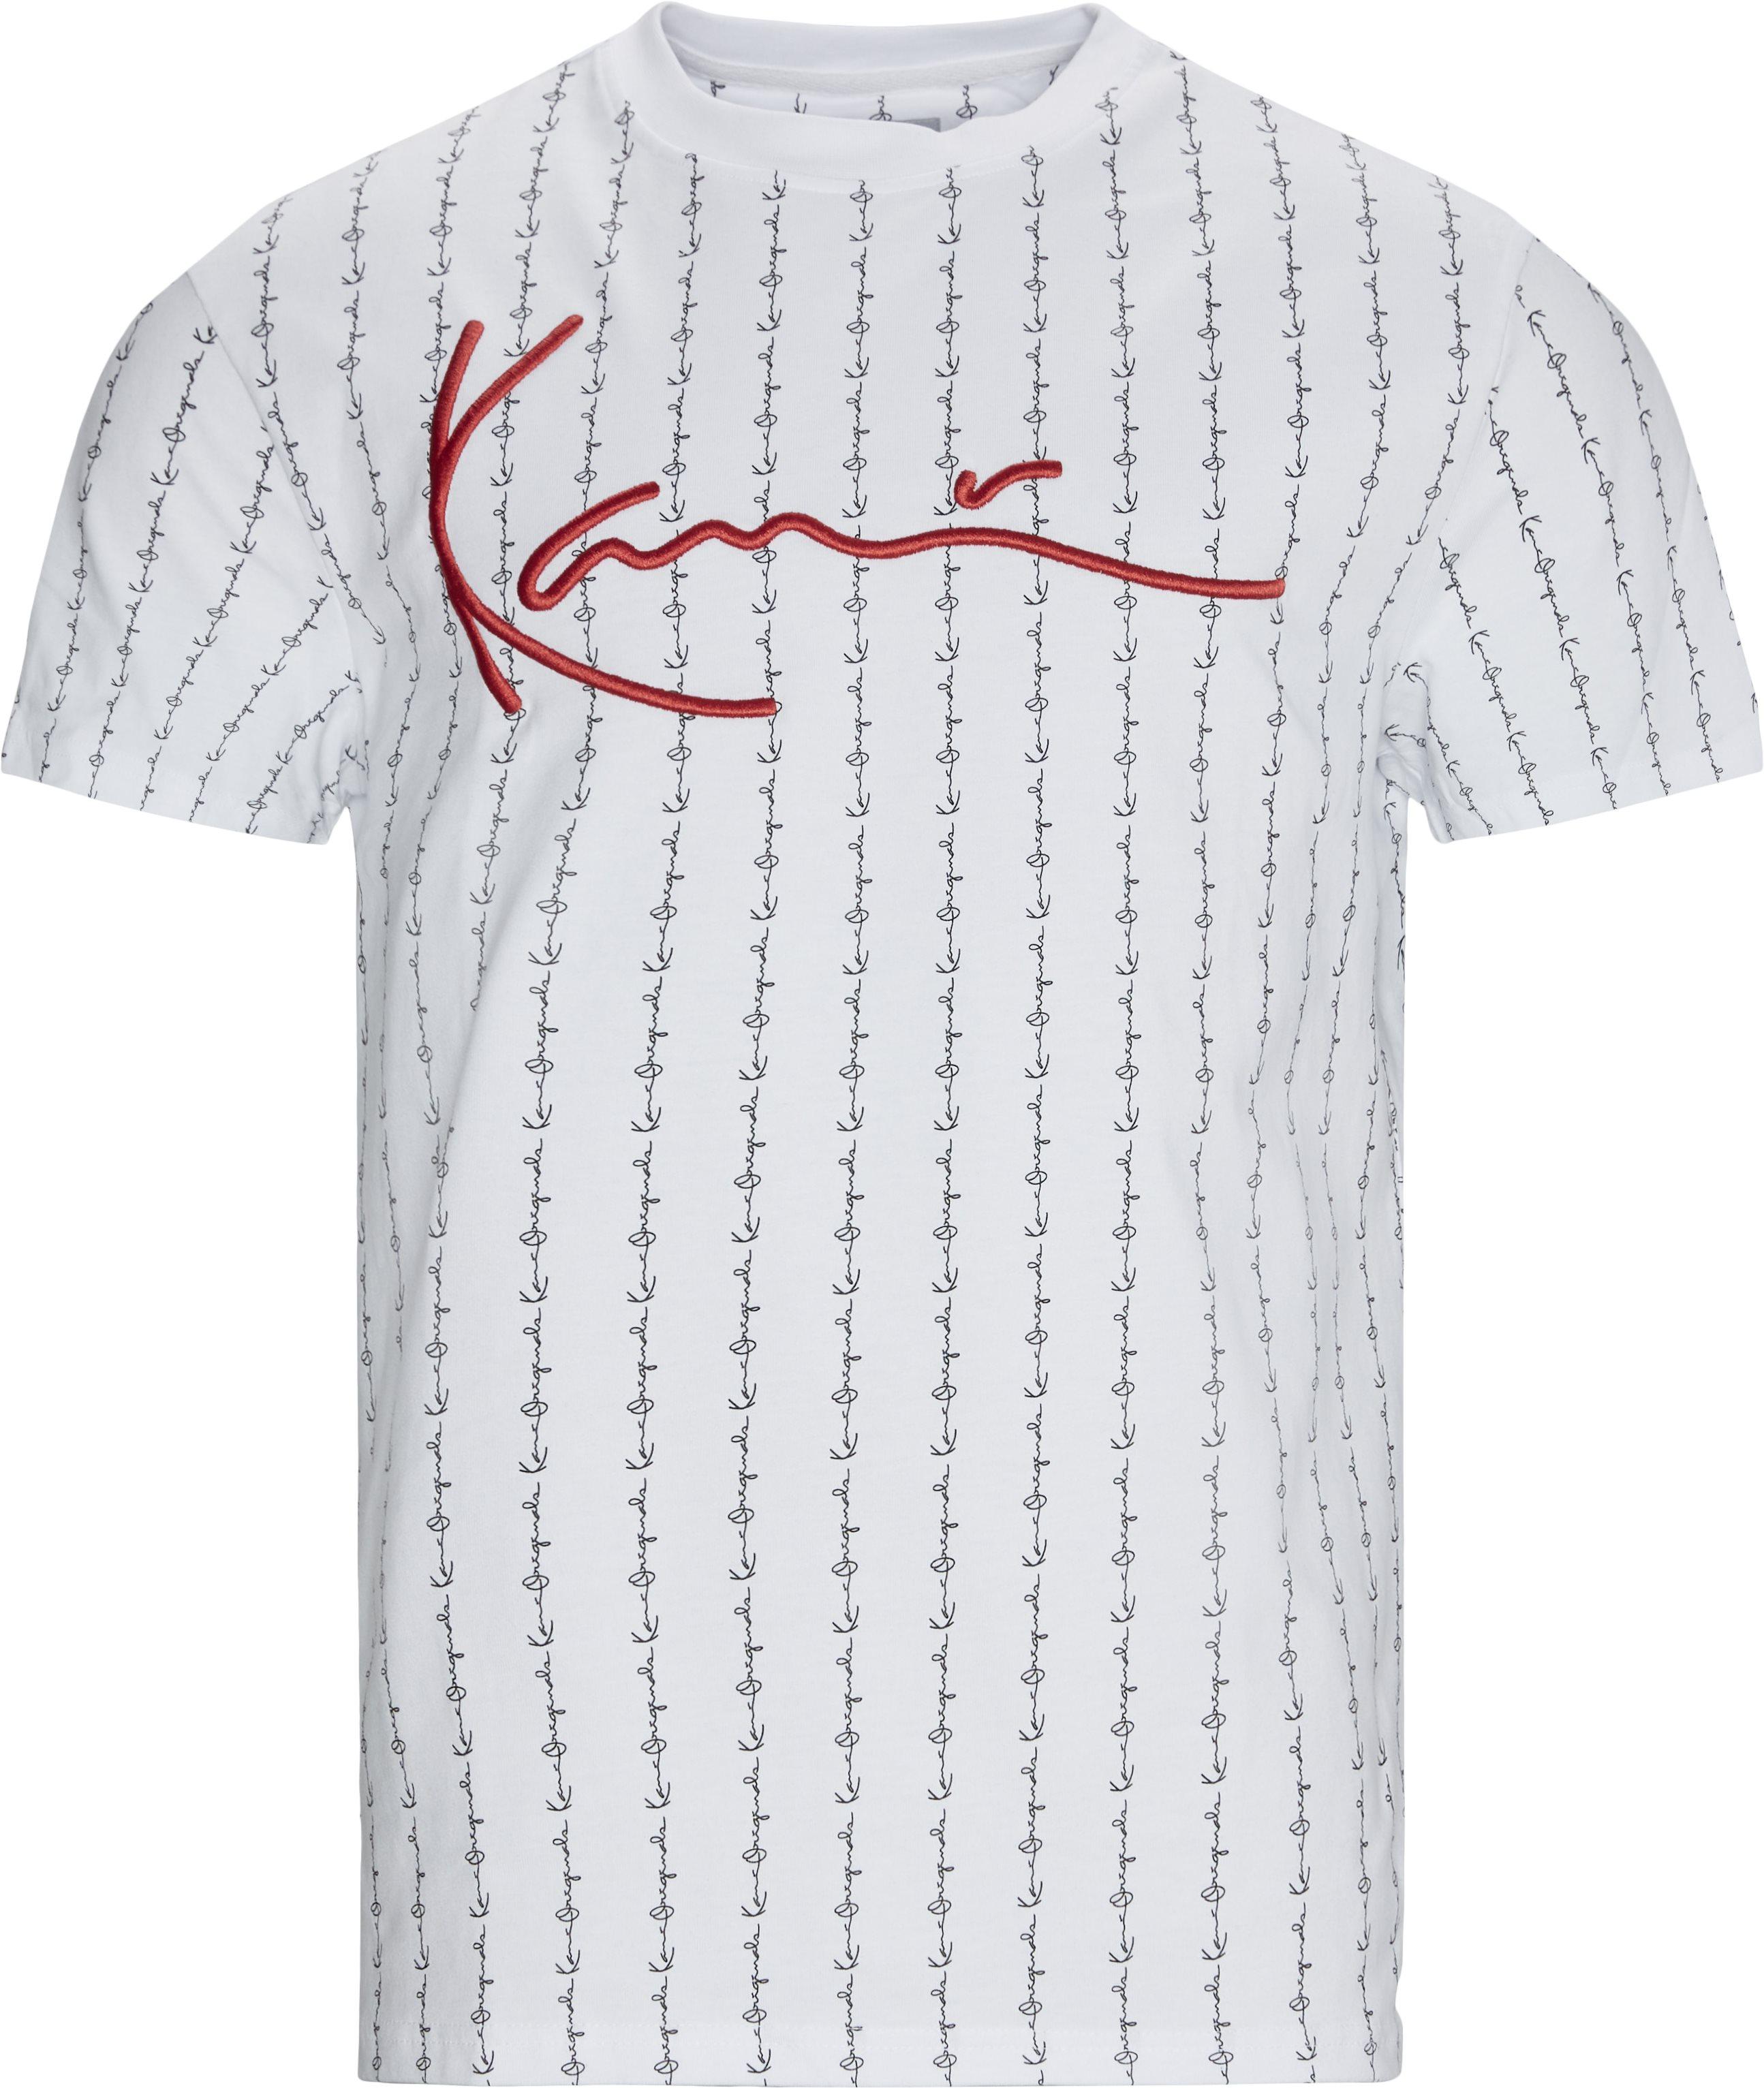 Signature Logo Pinstripe T-shirt - T-shirts - Regular - Hvid